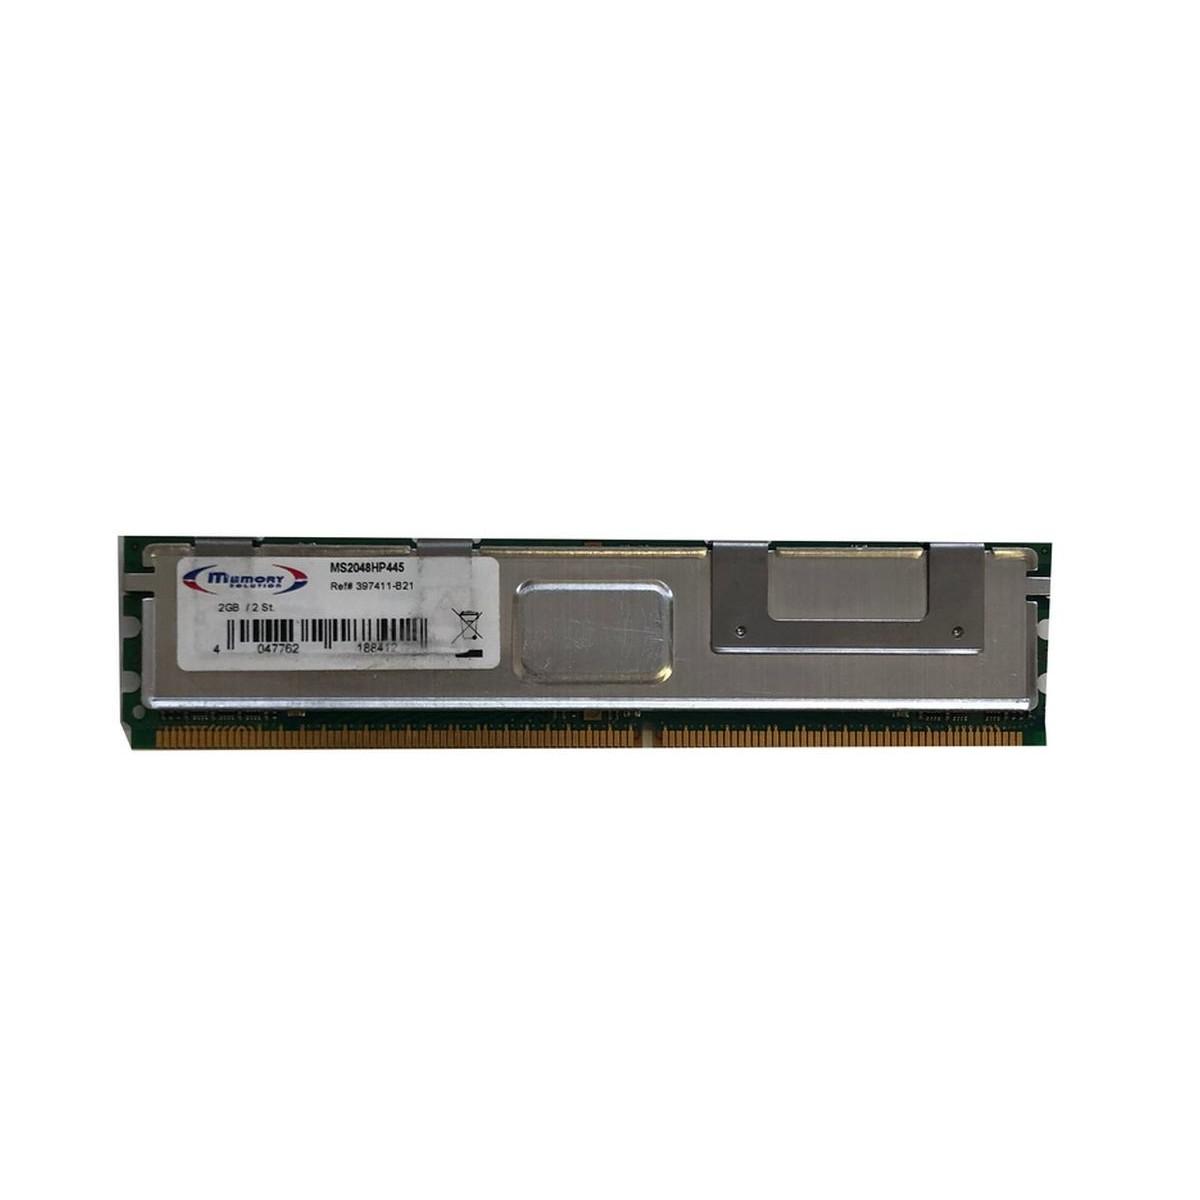 PAMIEC HP 2GB PC2-5300 FDB ECC 667MHZ 397411-B21